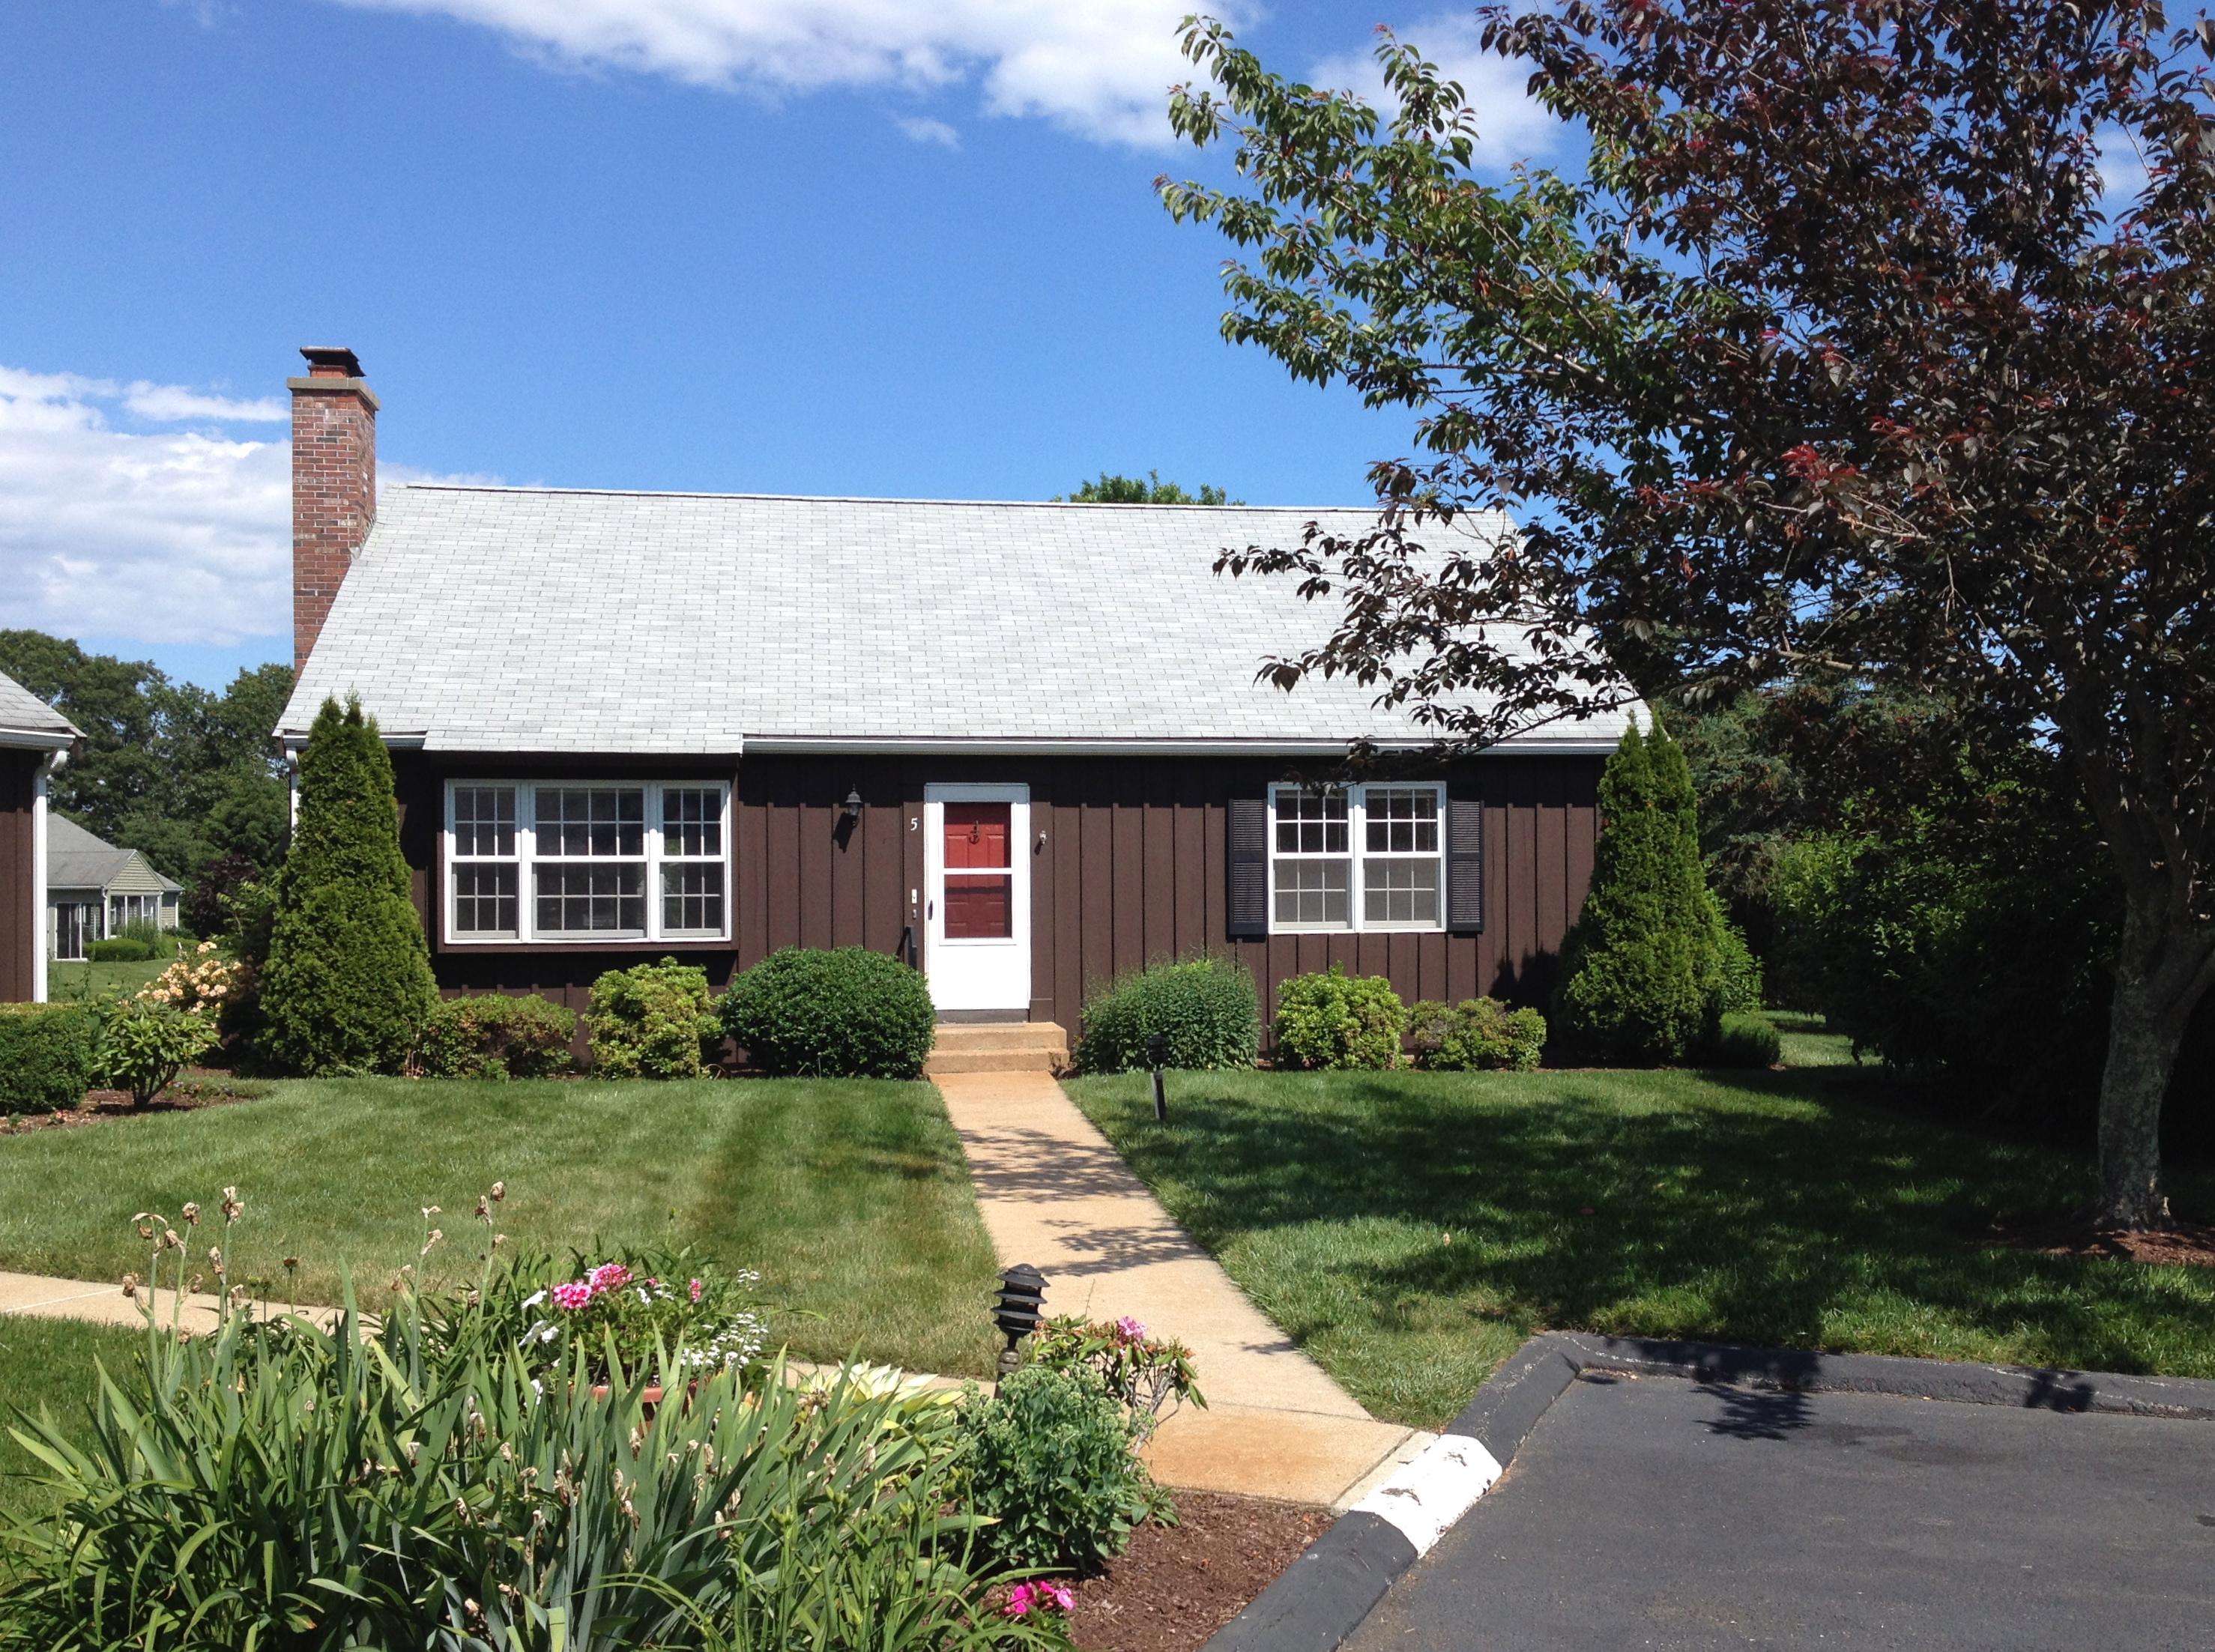 Casa Unifamiliar por un Venta en 5 Thelbridge St 5 Thelbridge St 5 Madison, Connecticut 06443 Estados Unidos